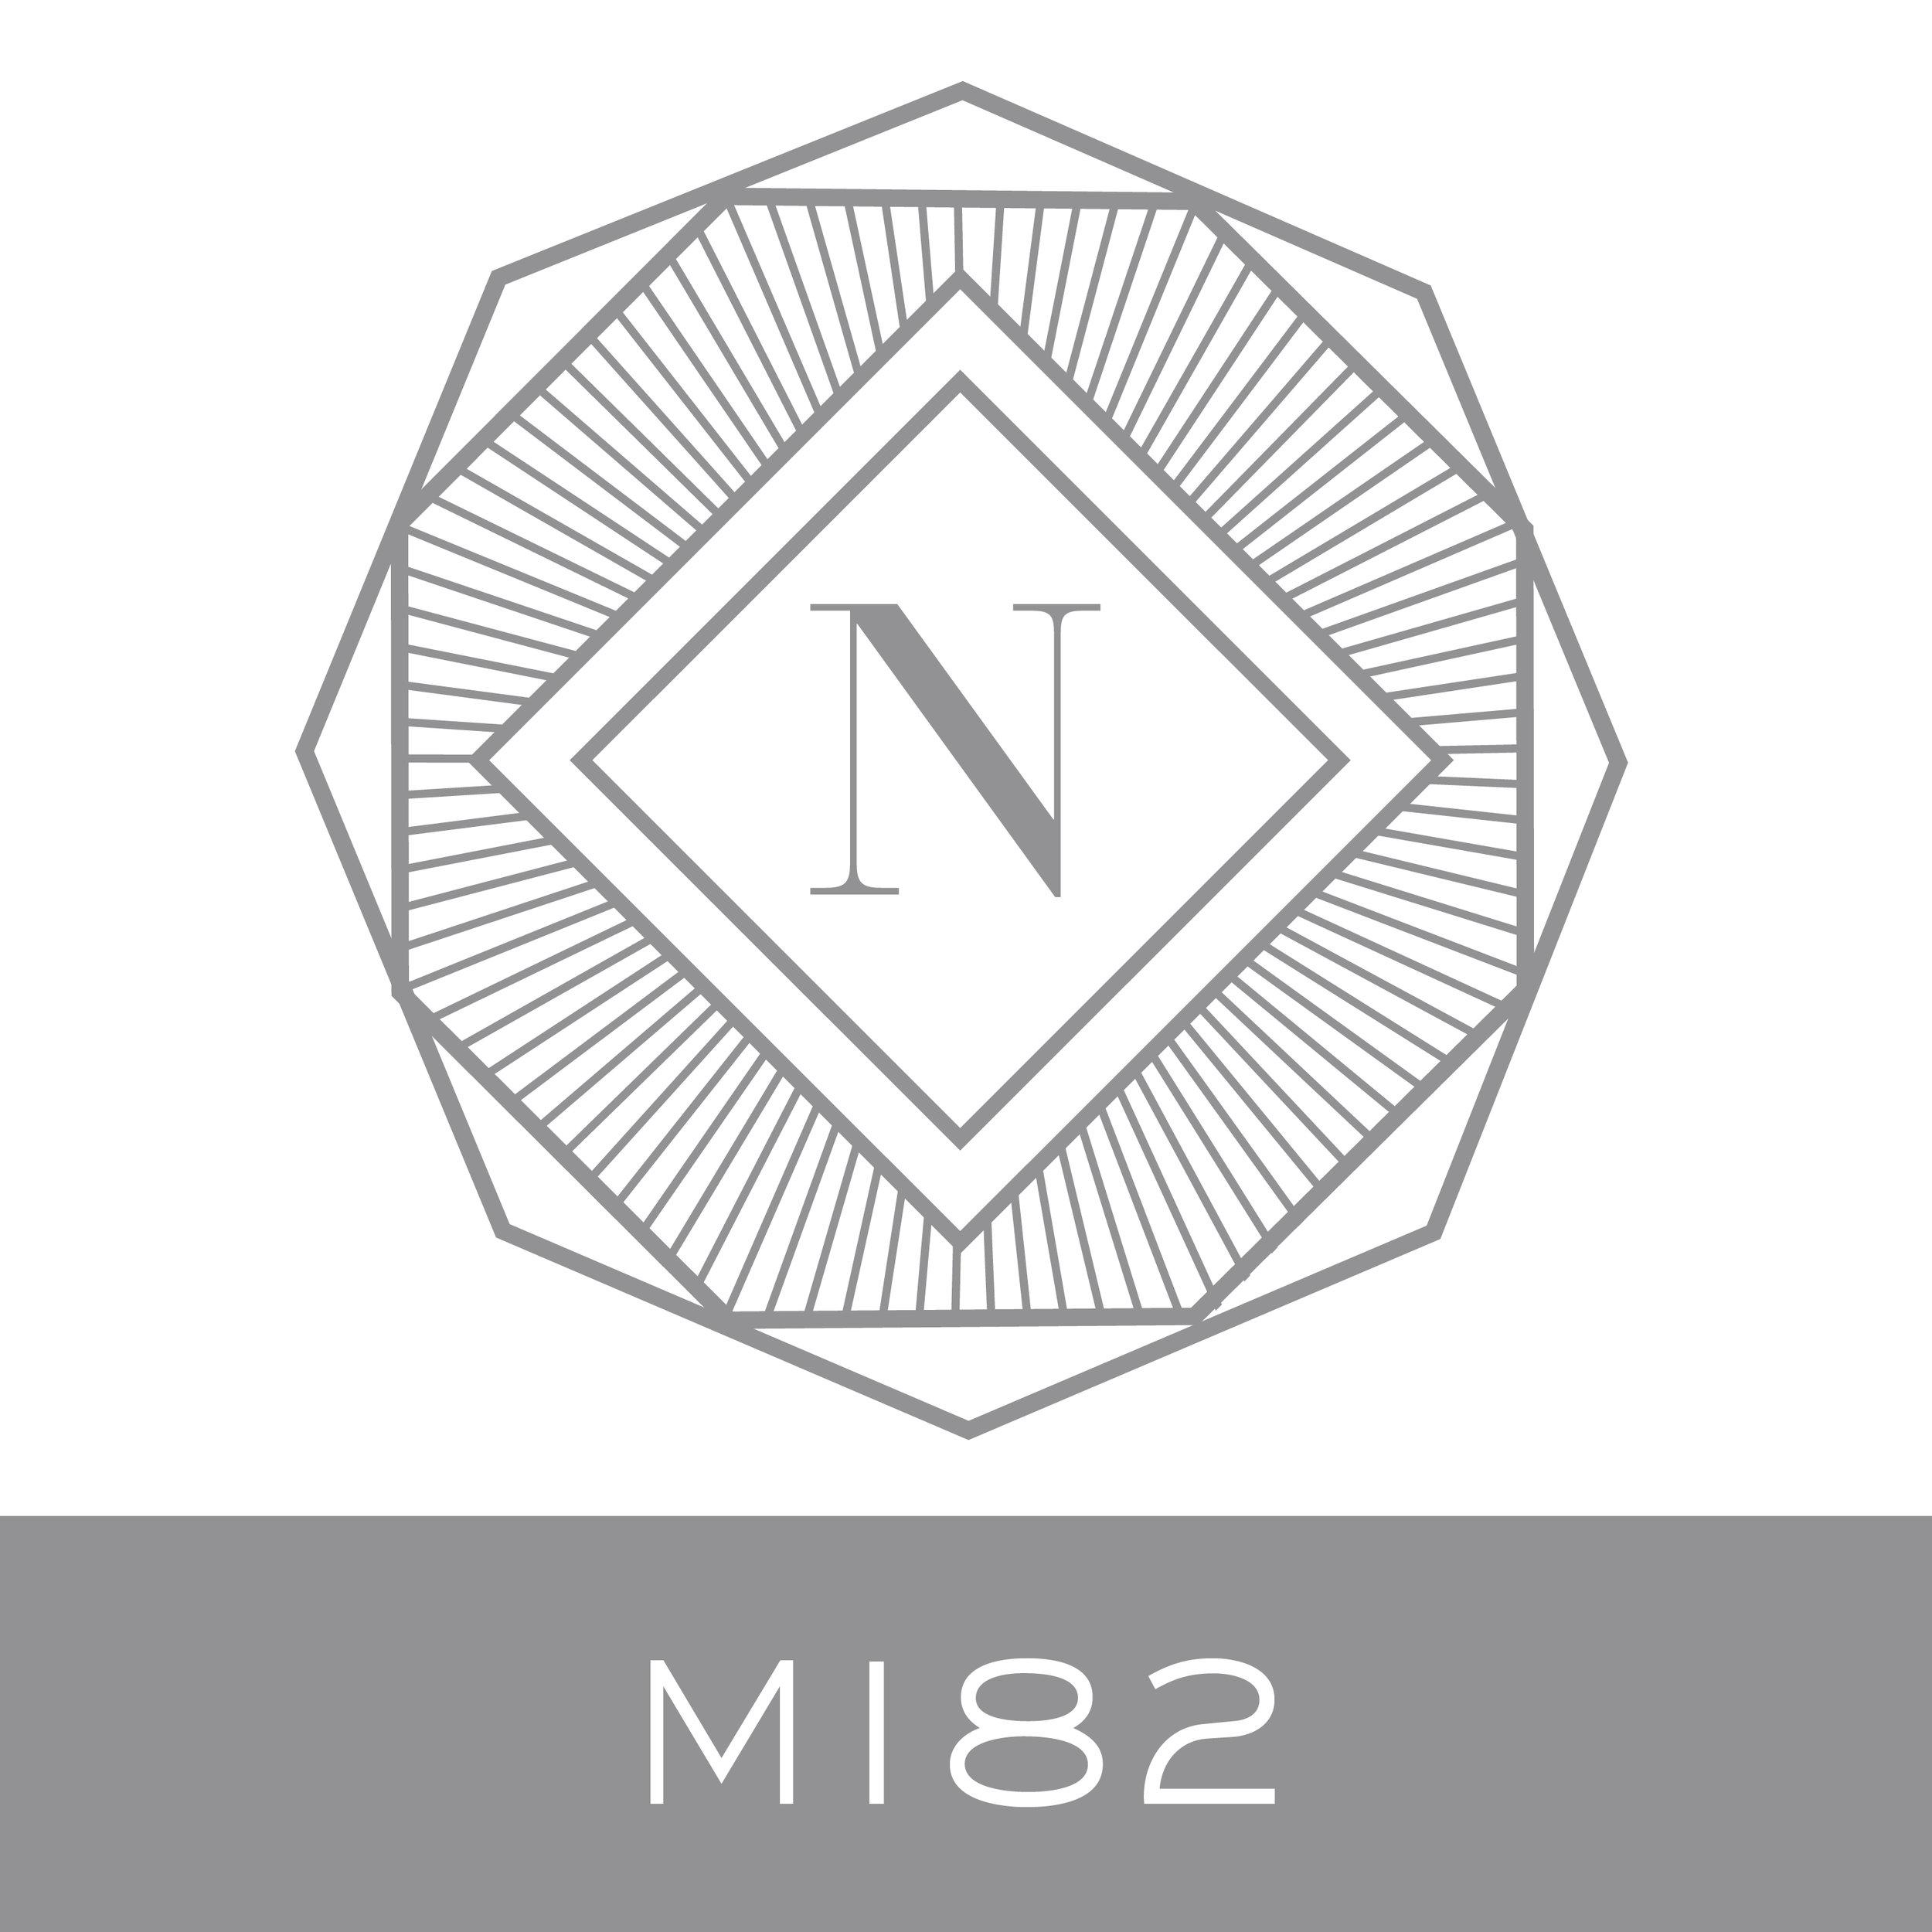 M182.jpg